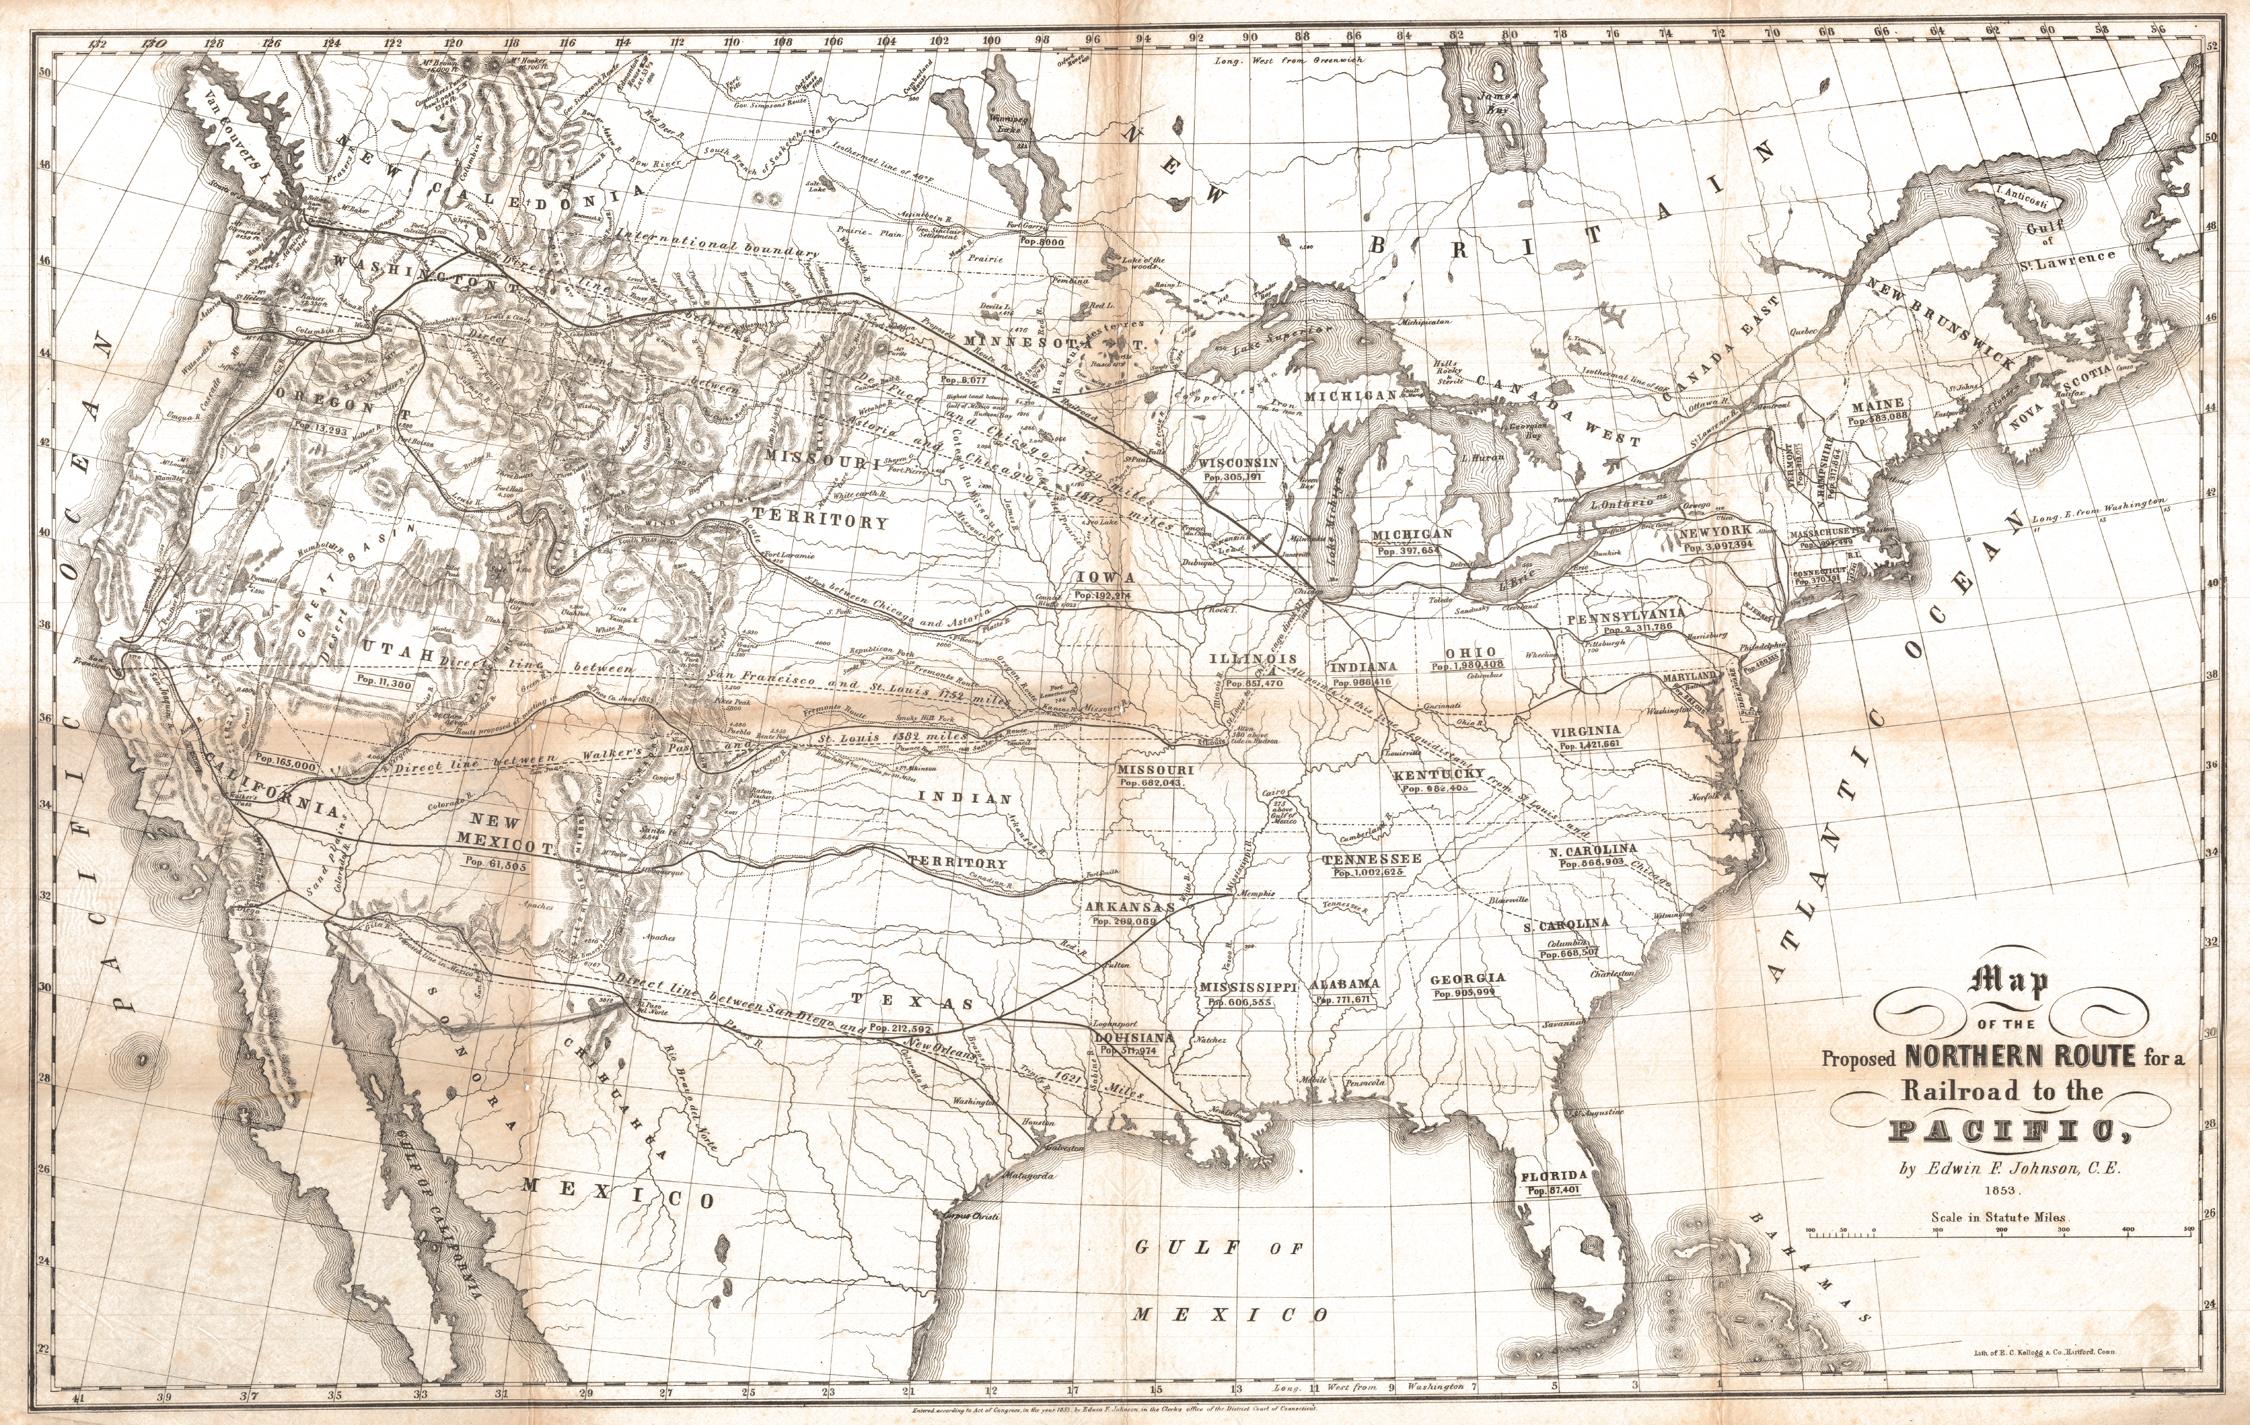 Transc railroad proposed routes 1853